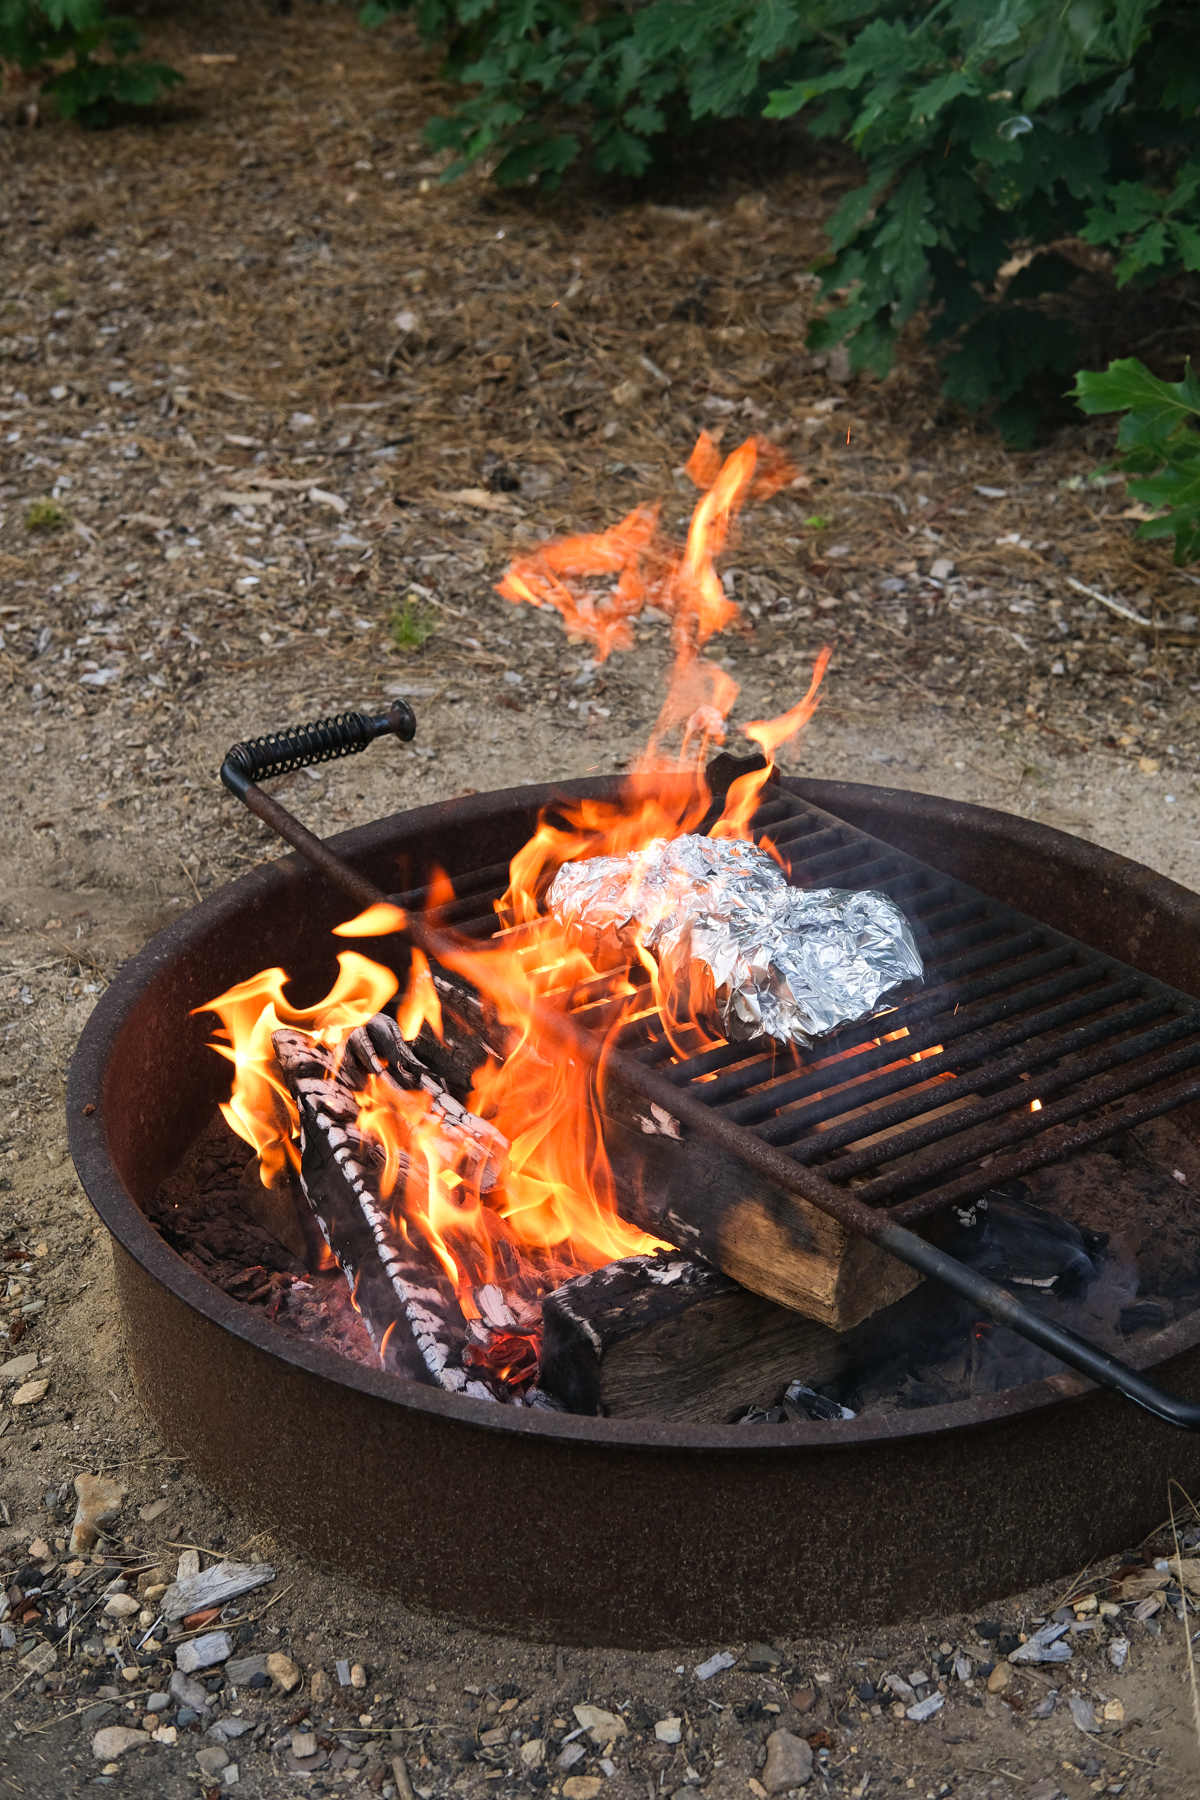 grilling kielbasa foil packs outside